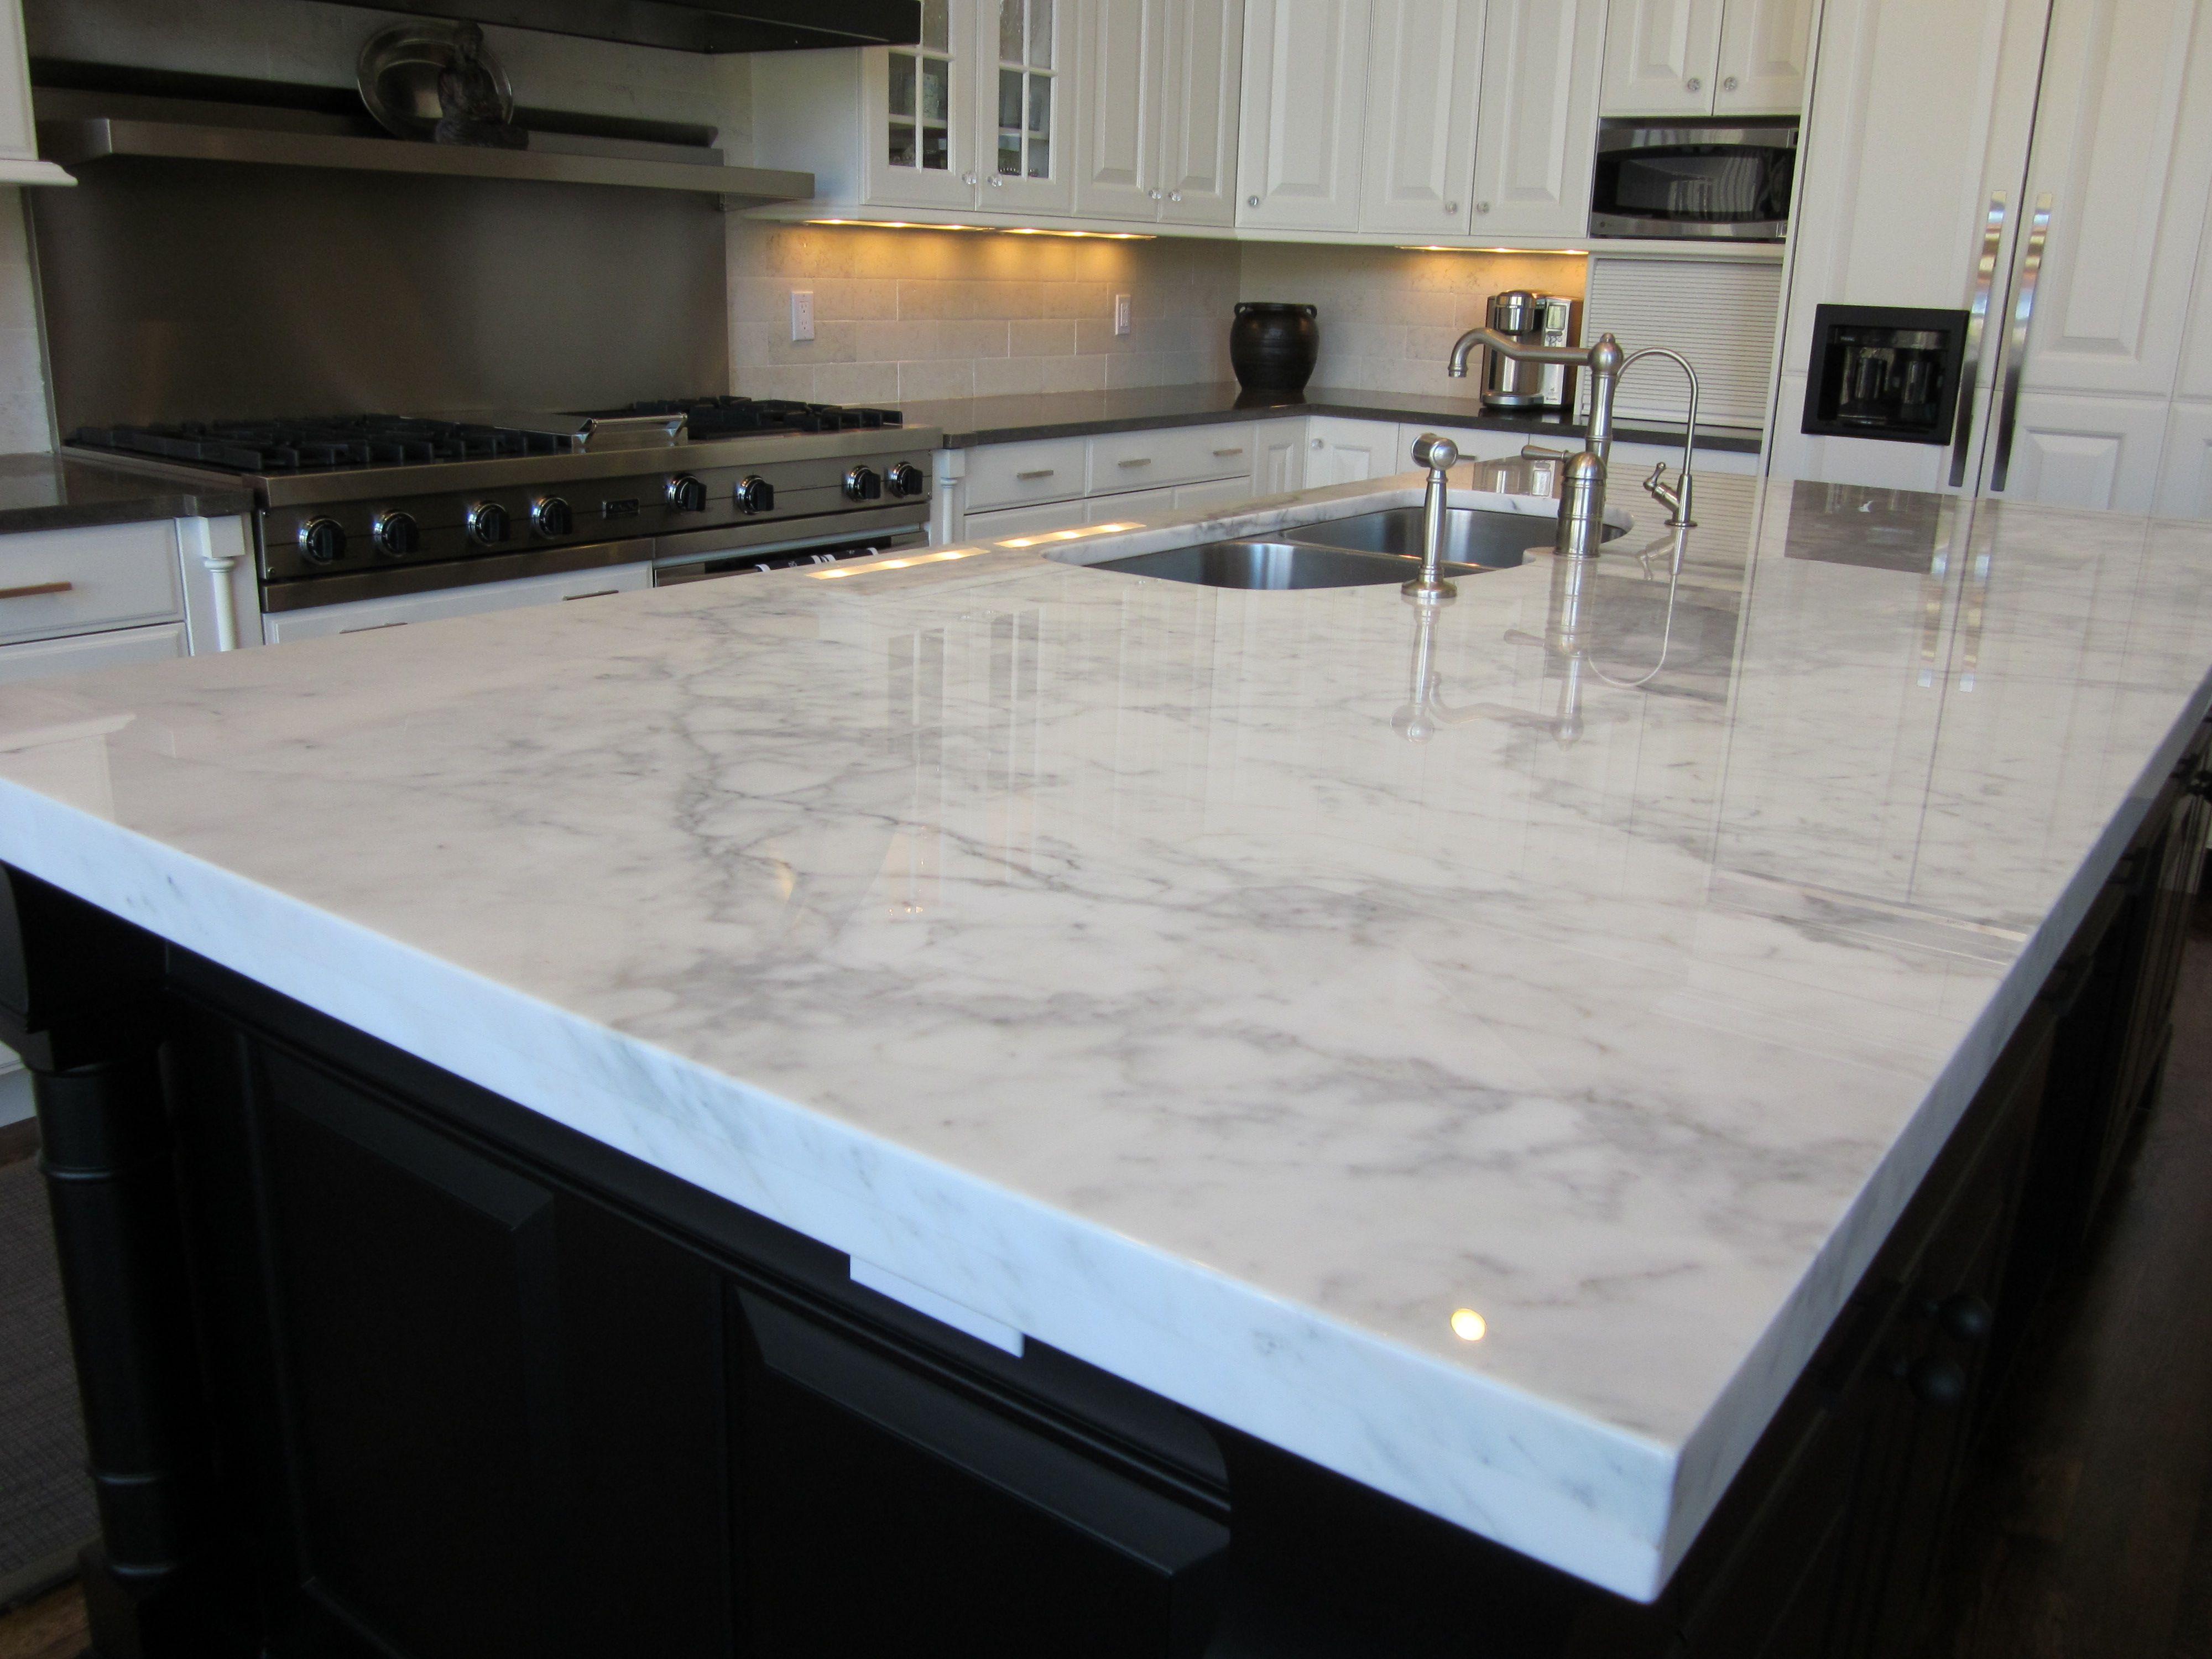 kitchen countertop materials White Granite Countertops Quartzite Countertops Countertops For Kitchen Countertop Options Countertops Marble Look Granite Supreme White Granite